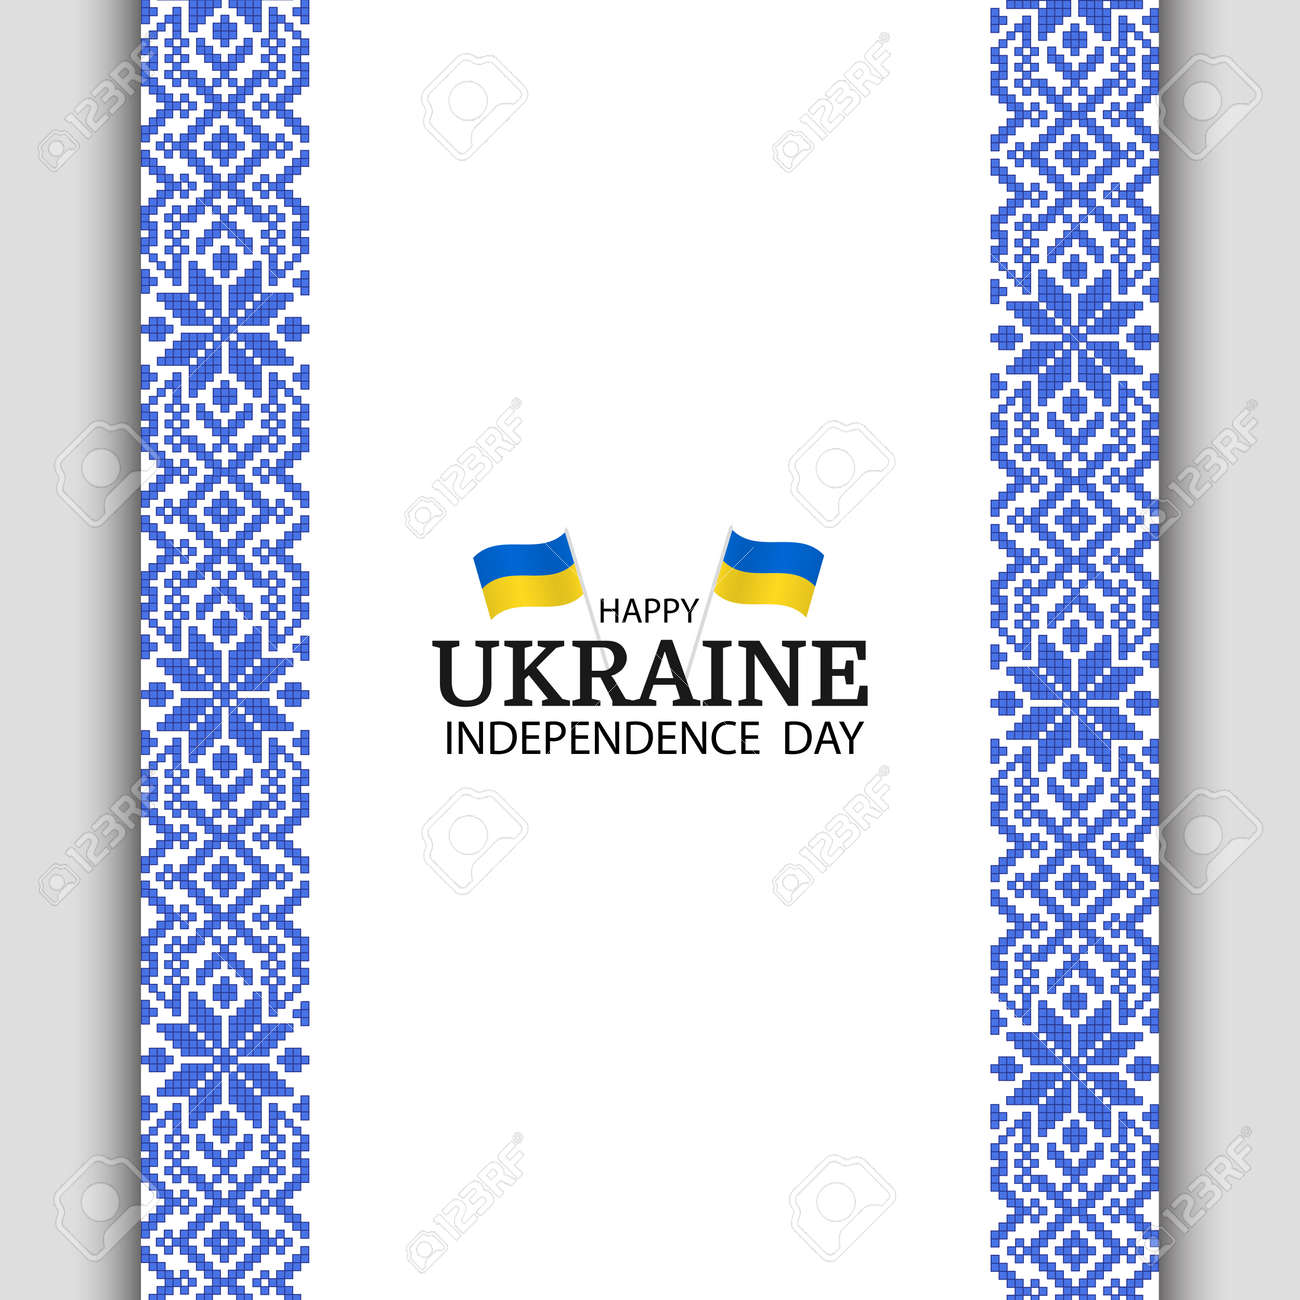 Vector Illustration of Ukraine Independence Day. National pattern. - 170744991